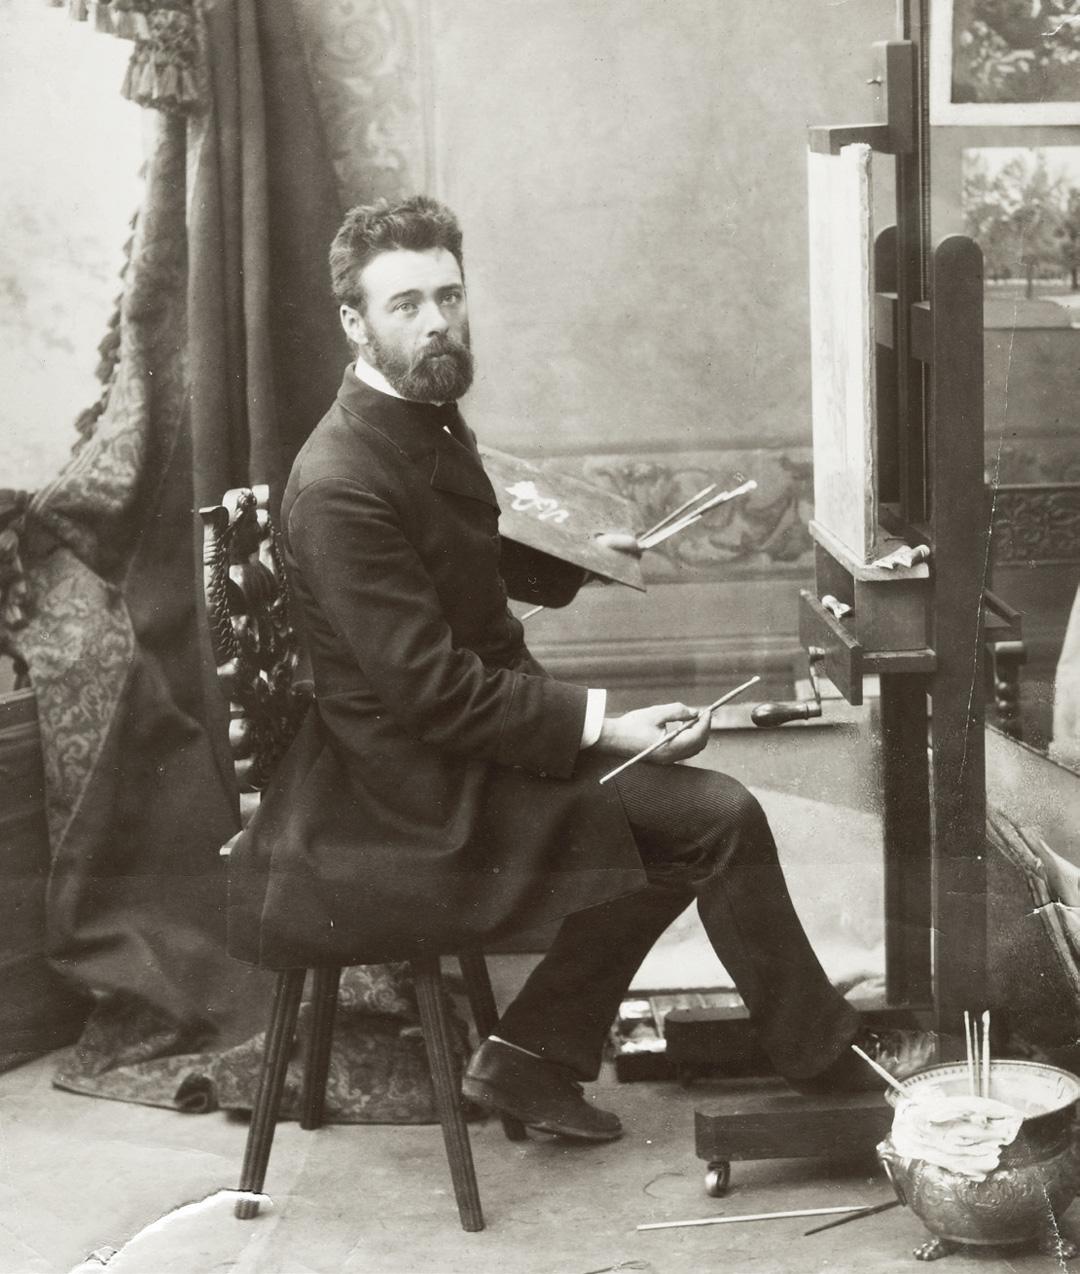 06-loeilsensible-Jean-Lacroix-Ferdinand-Hodler-au-chevalet-1883-Archives-Jura-Bruschweiler.